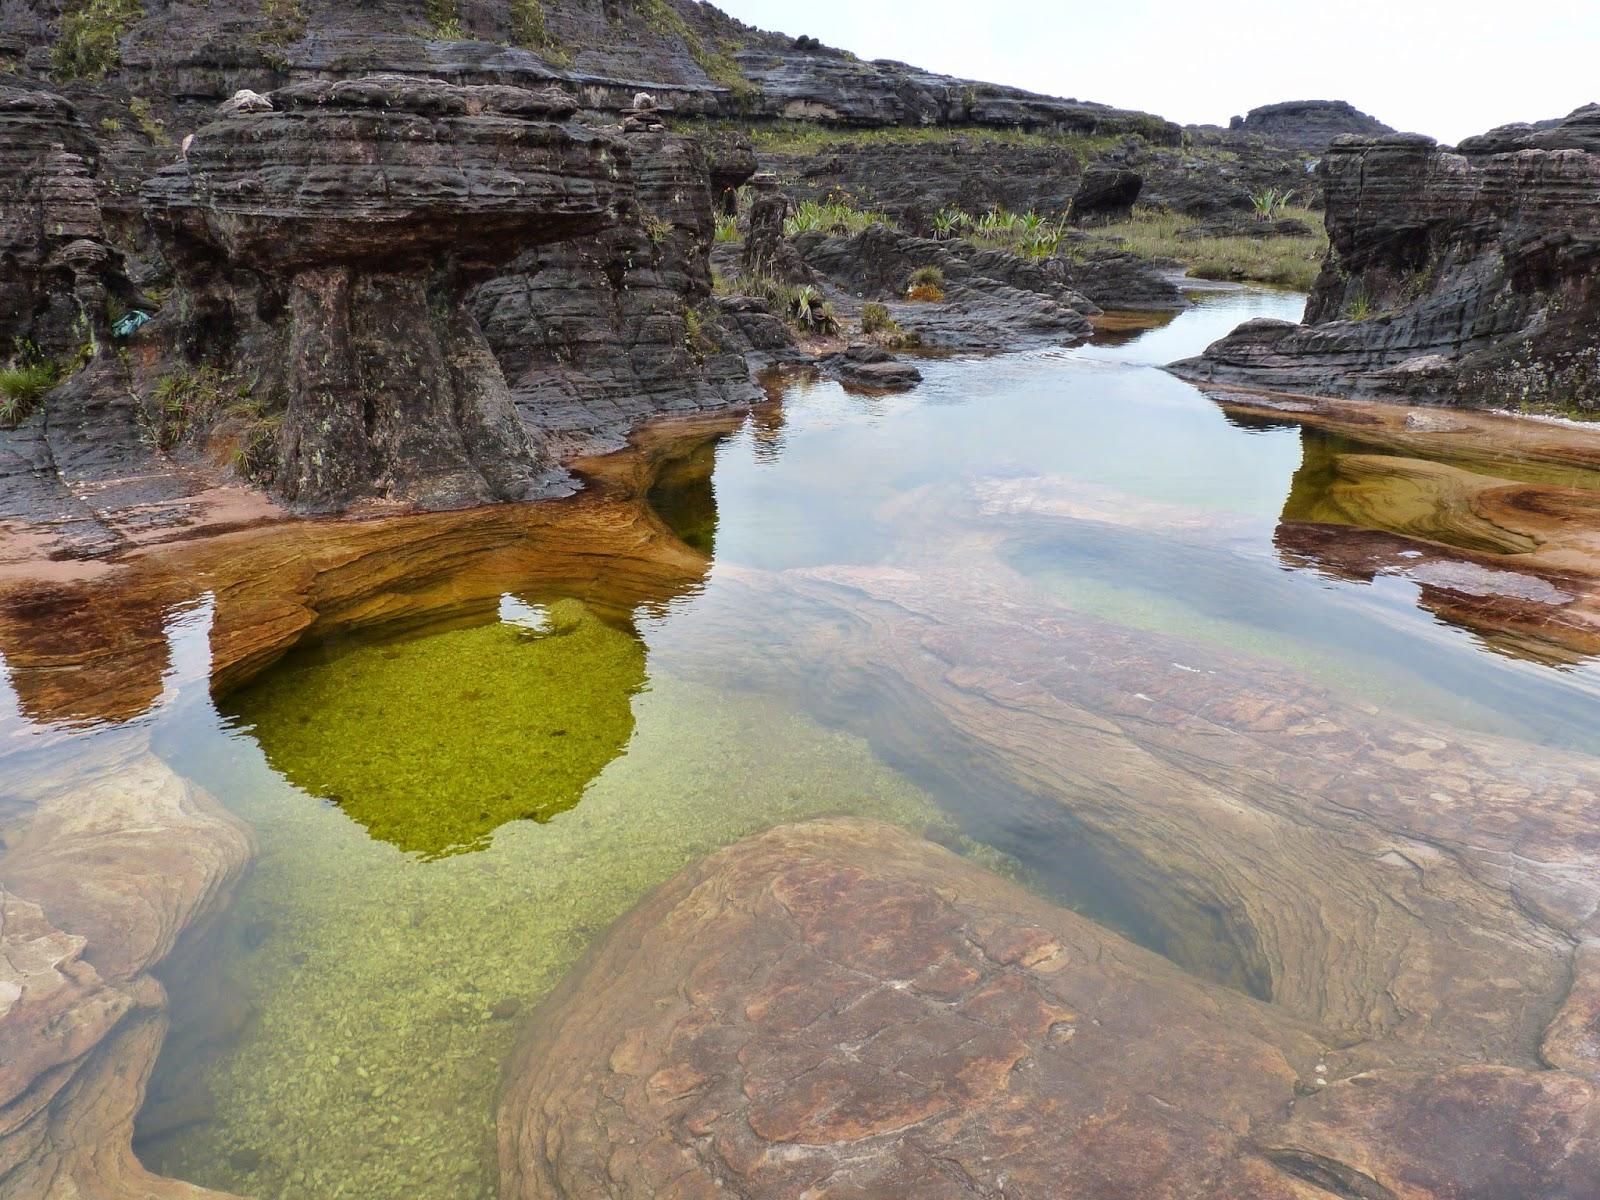 Piscinas Naturais no Monte Roraima